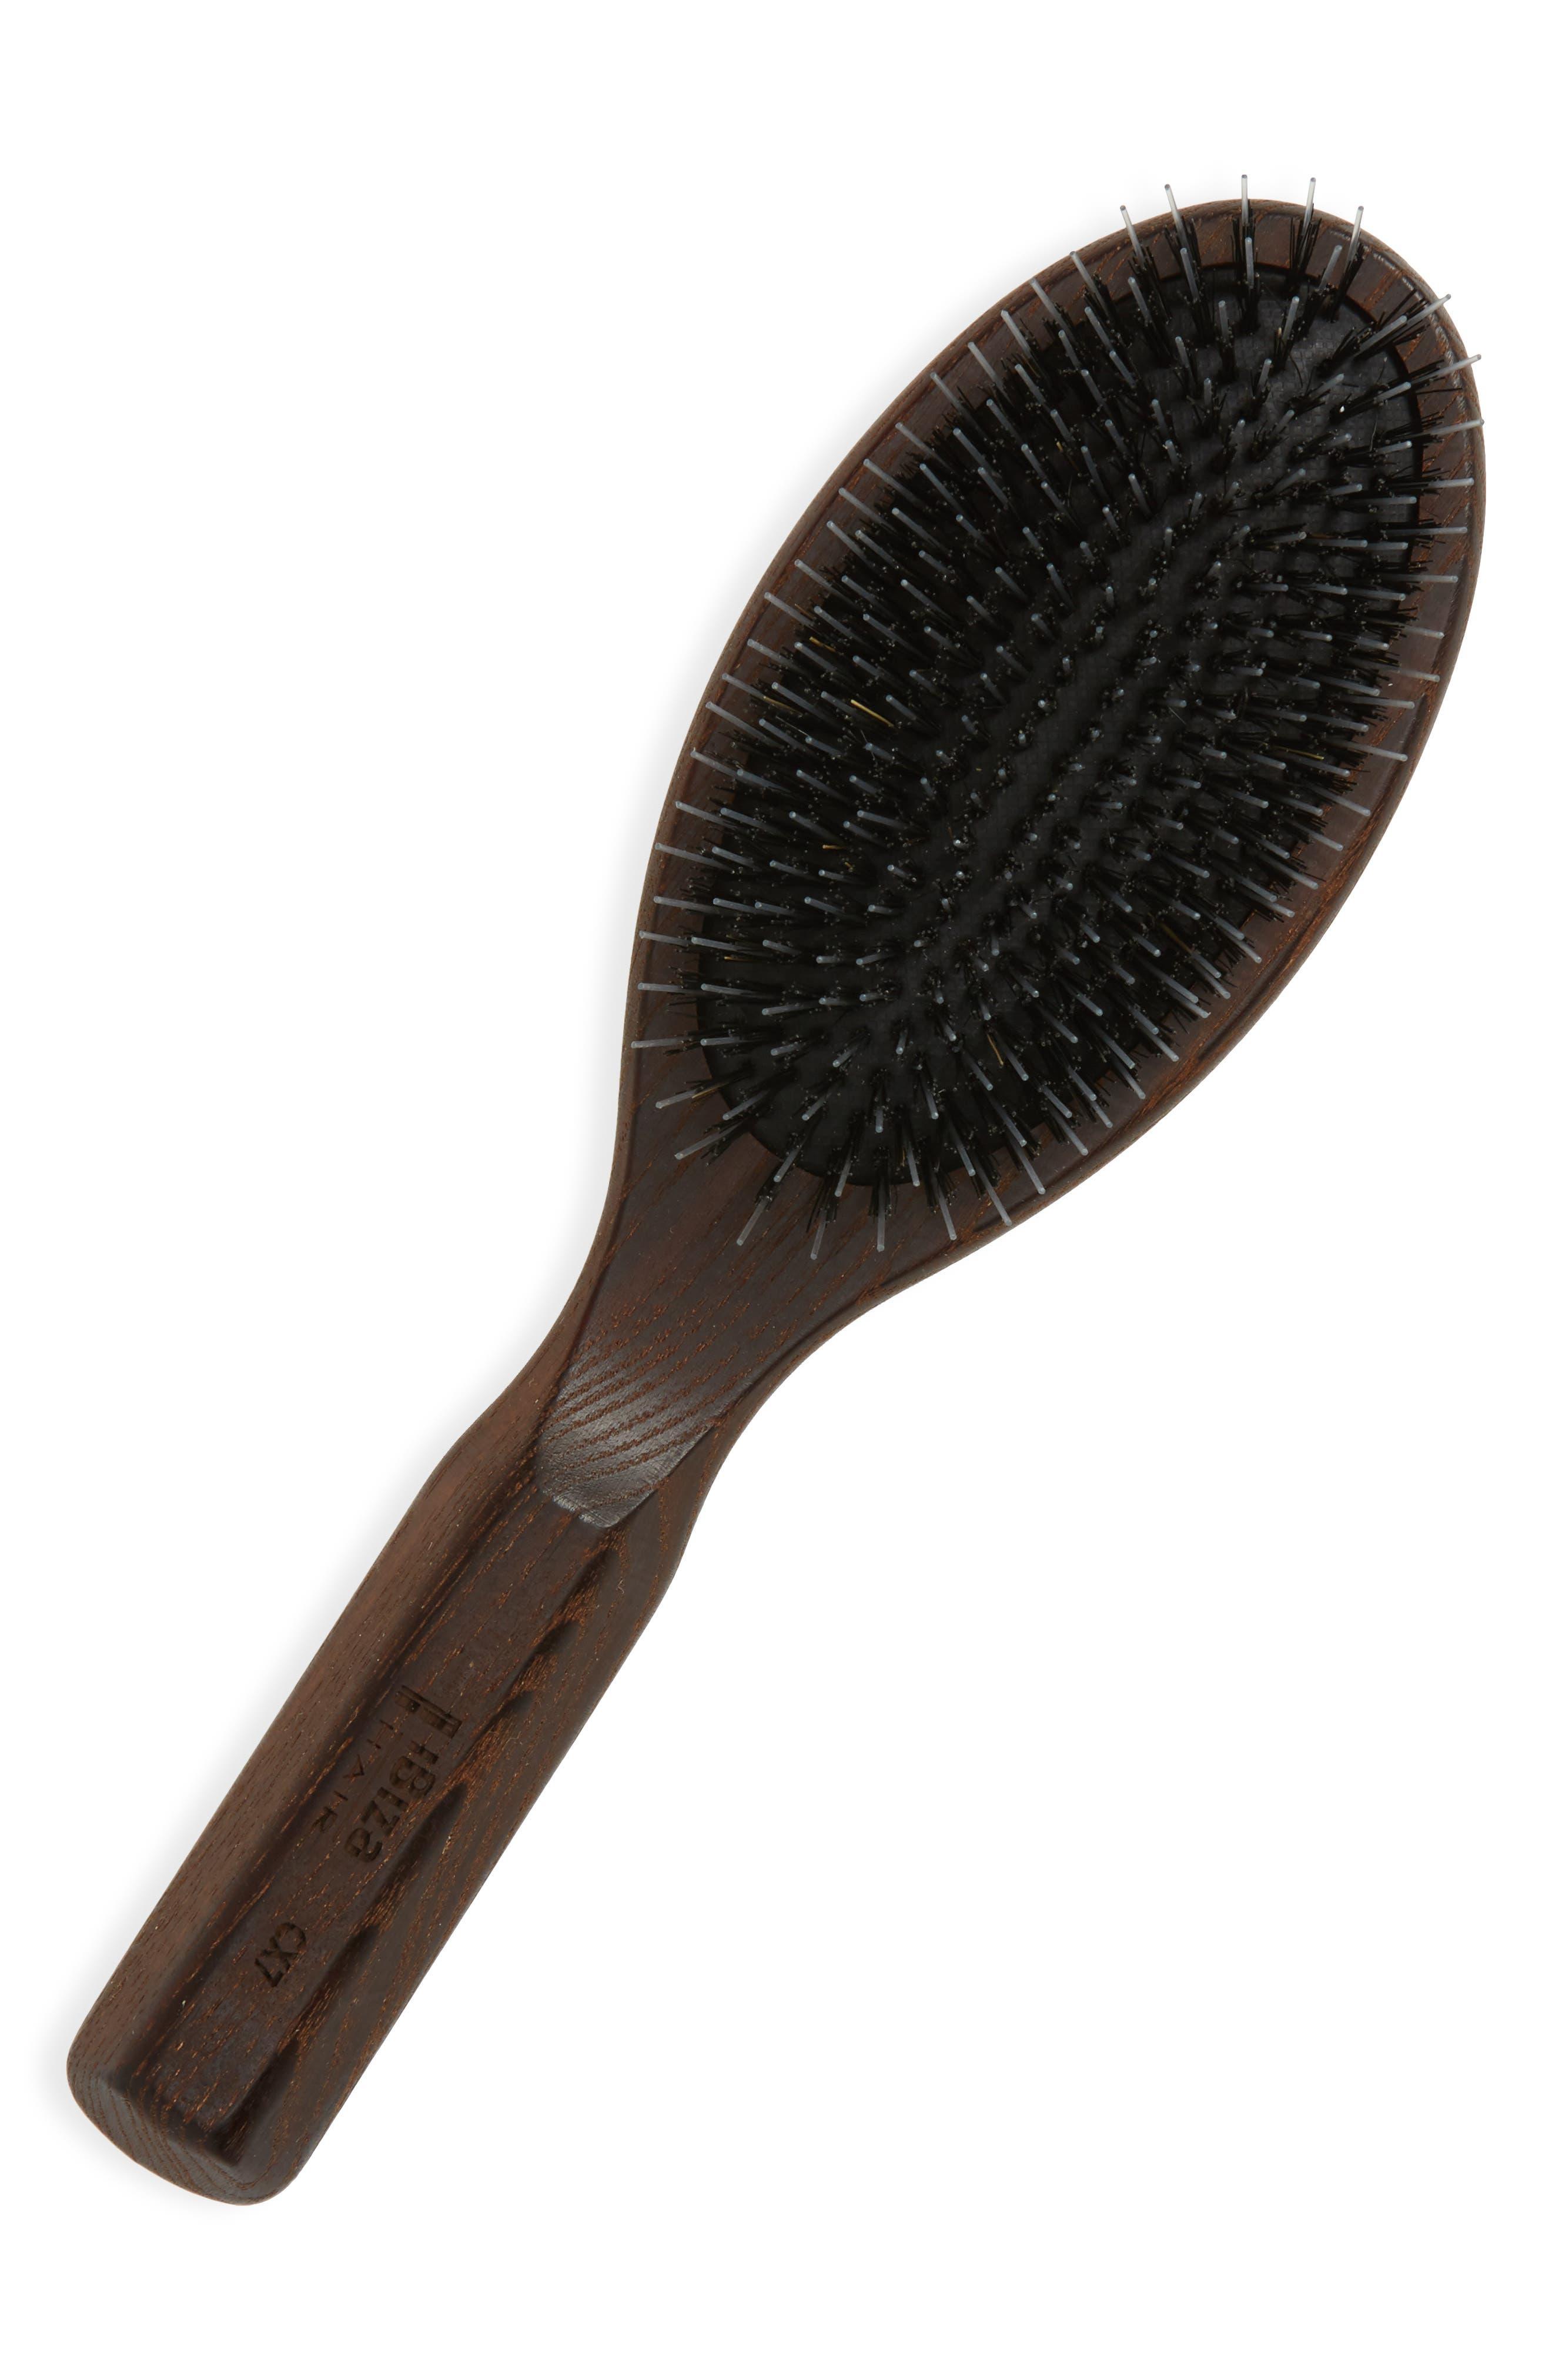 Cx7 Oval Handle Brush